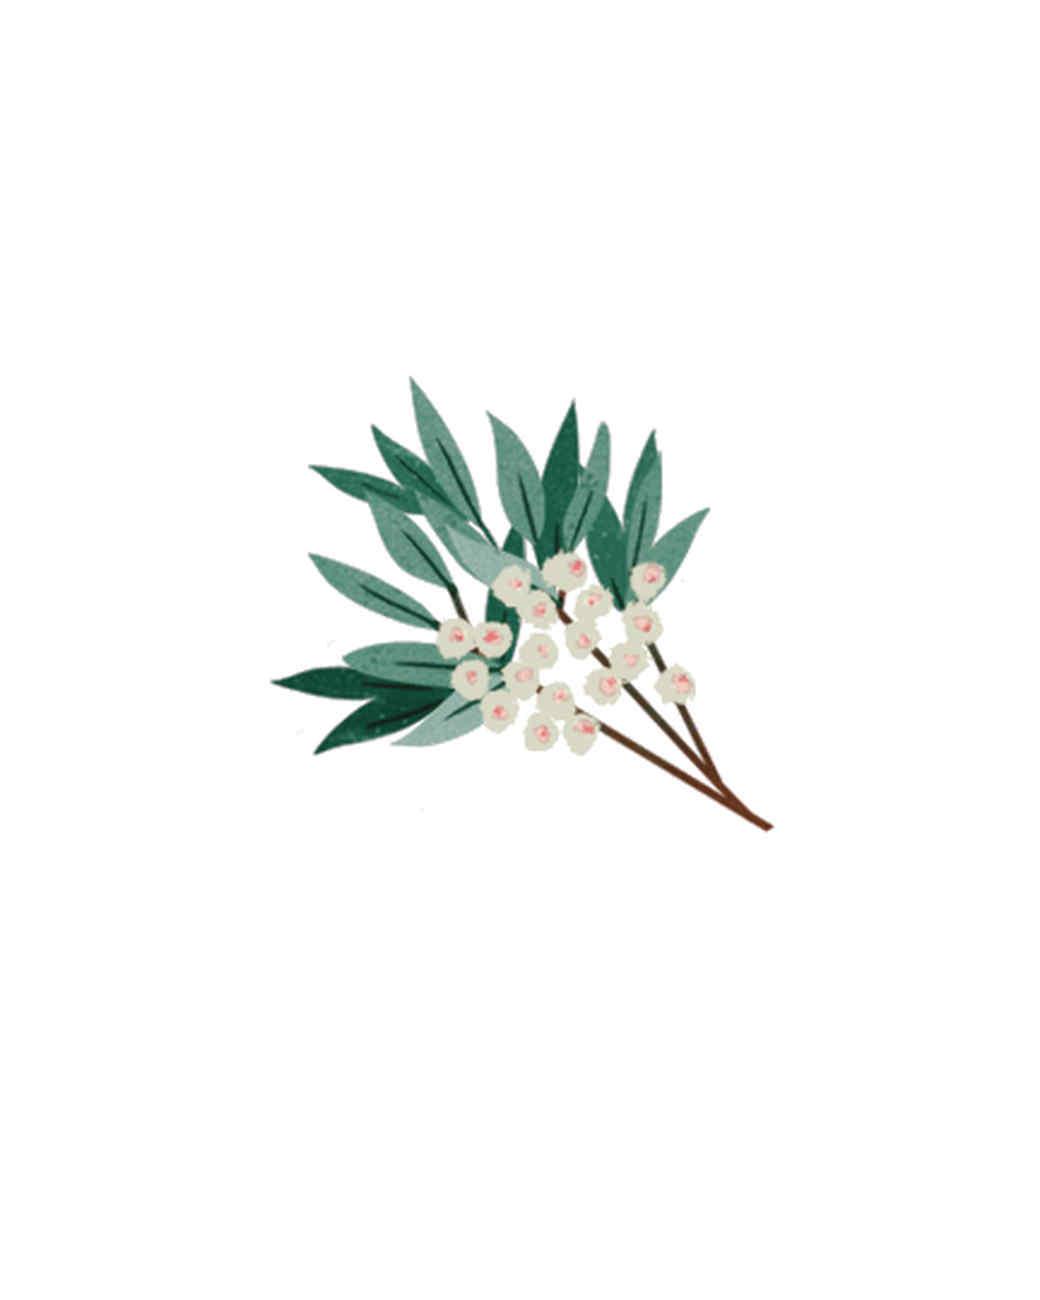 essential-oils-illustration-04.jpg